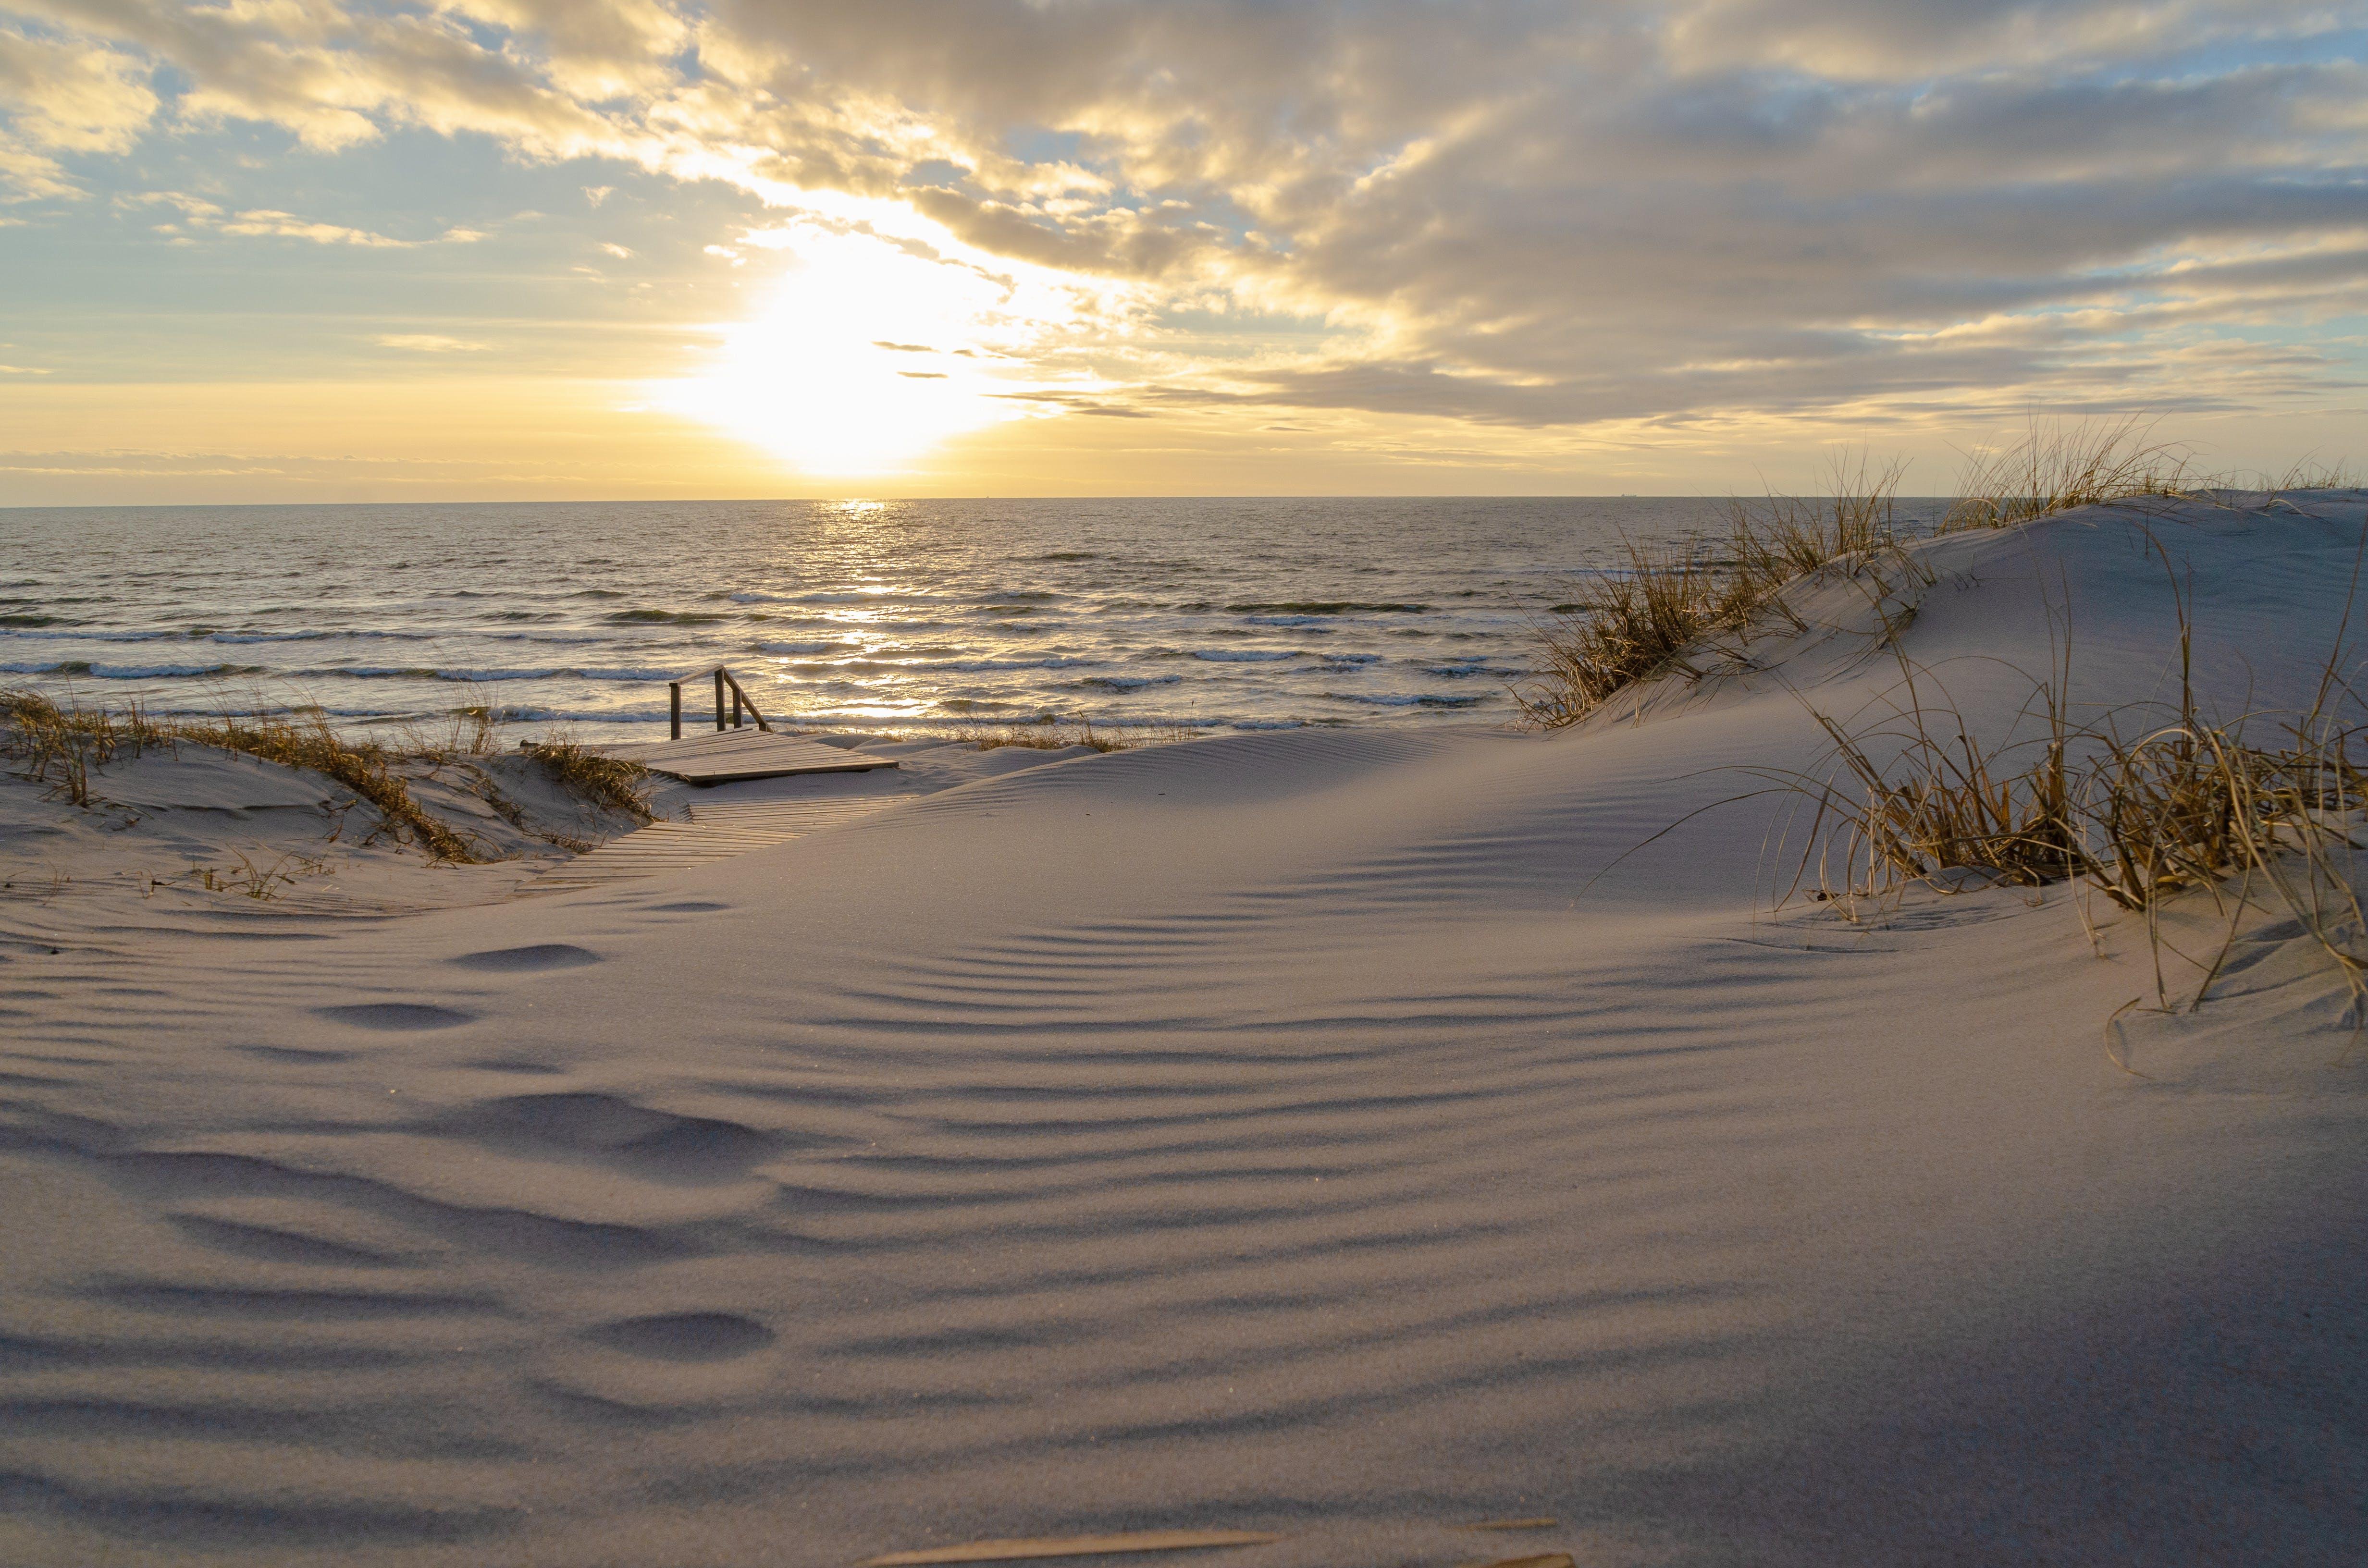 Free stock photo of Baltic Sea, beach, bridge, cluods